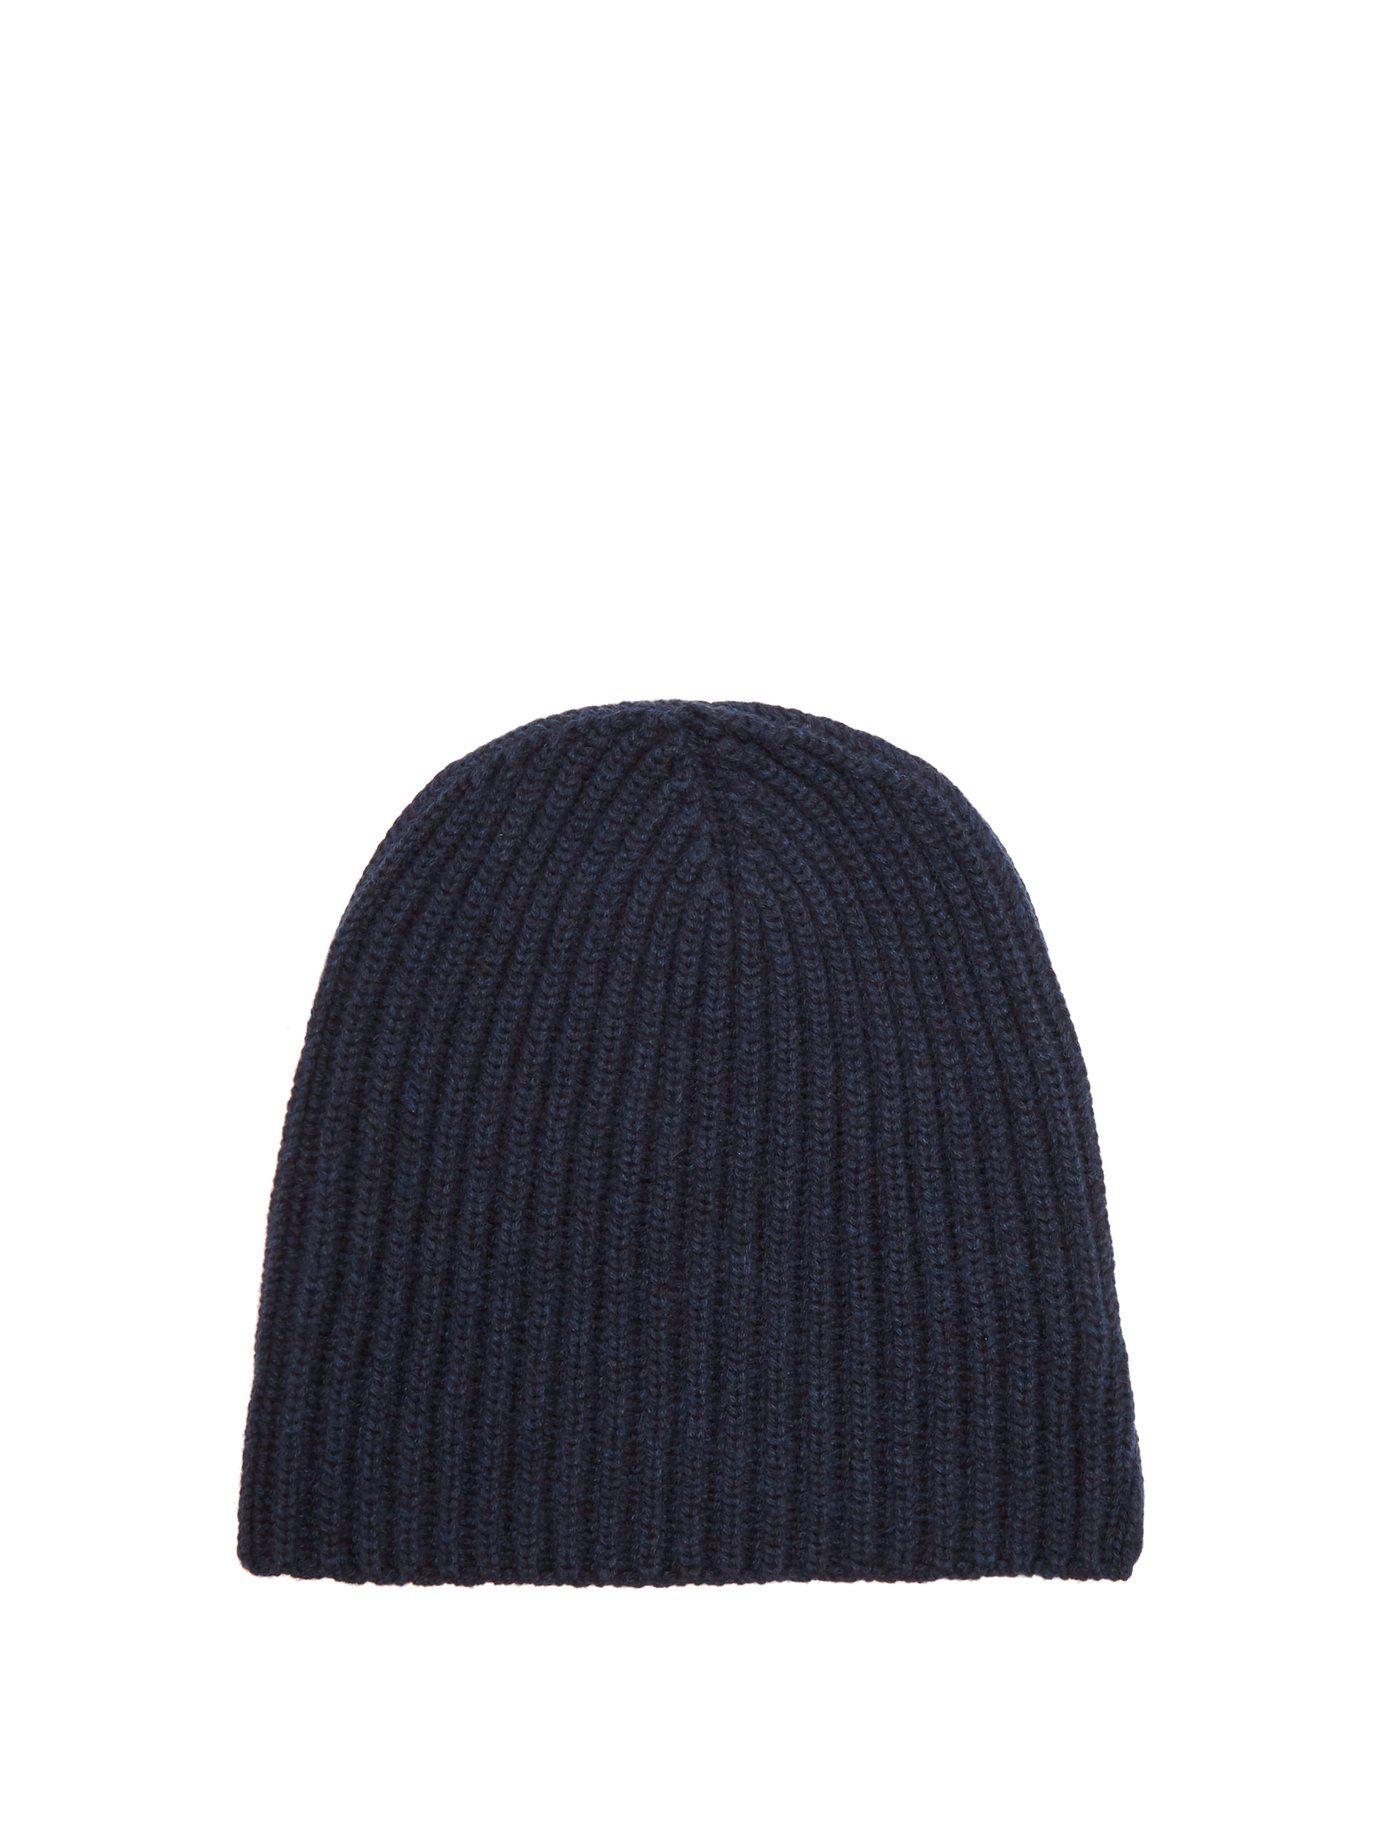 0cb22da8f43 Lyst - Thom Sweeney Rib-knit Cashmere Hat in Blue for Men